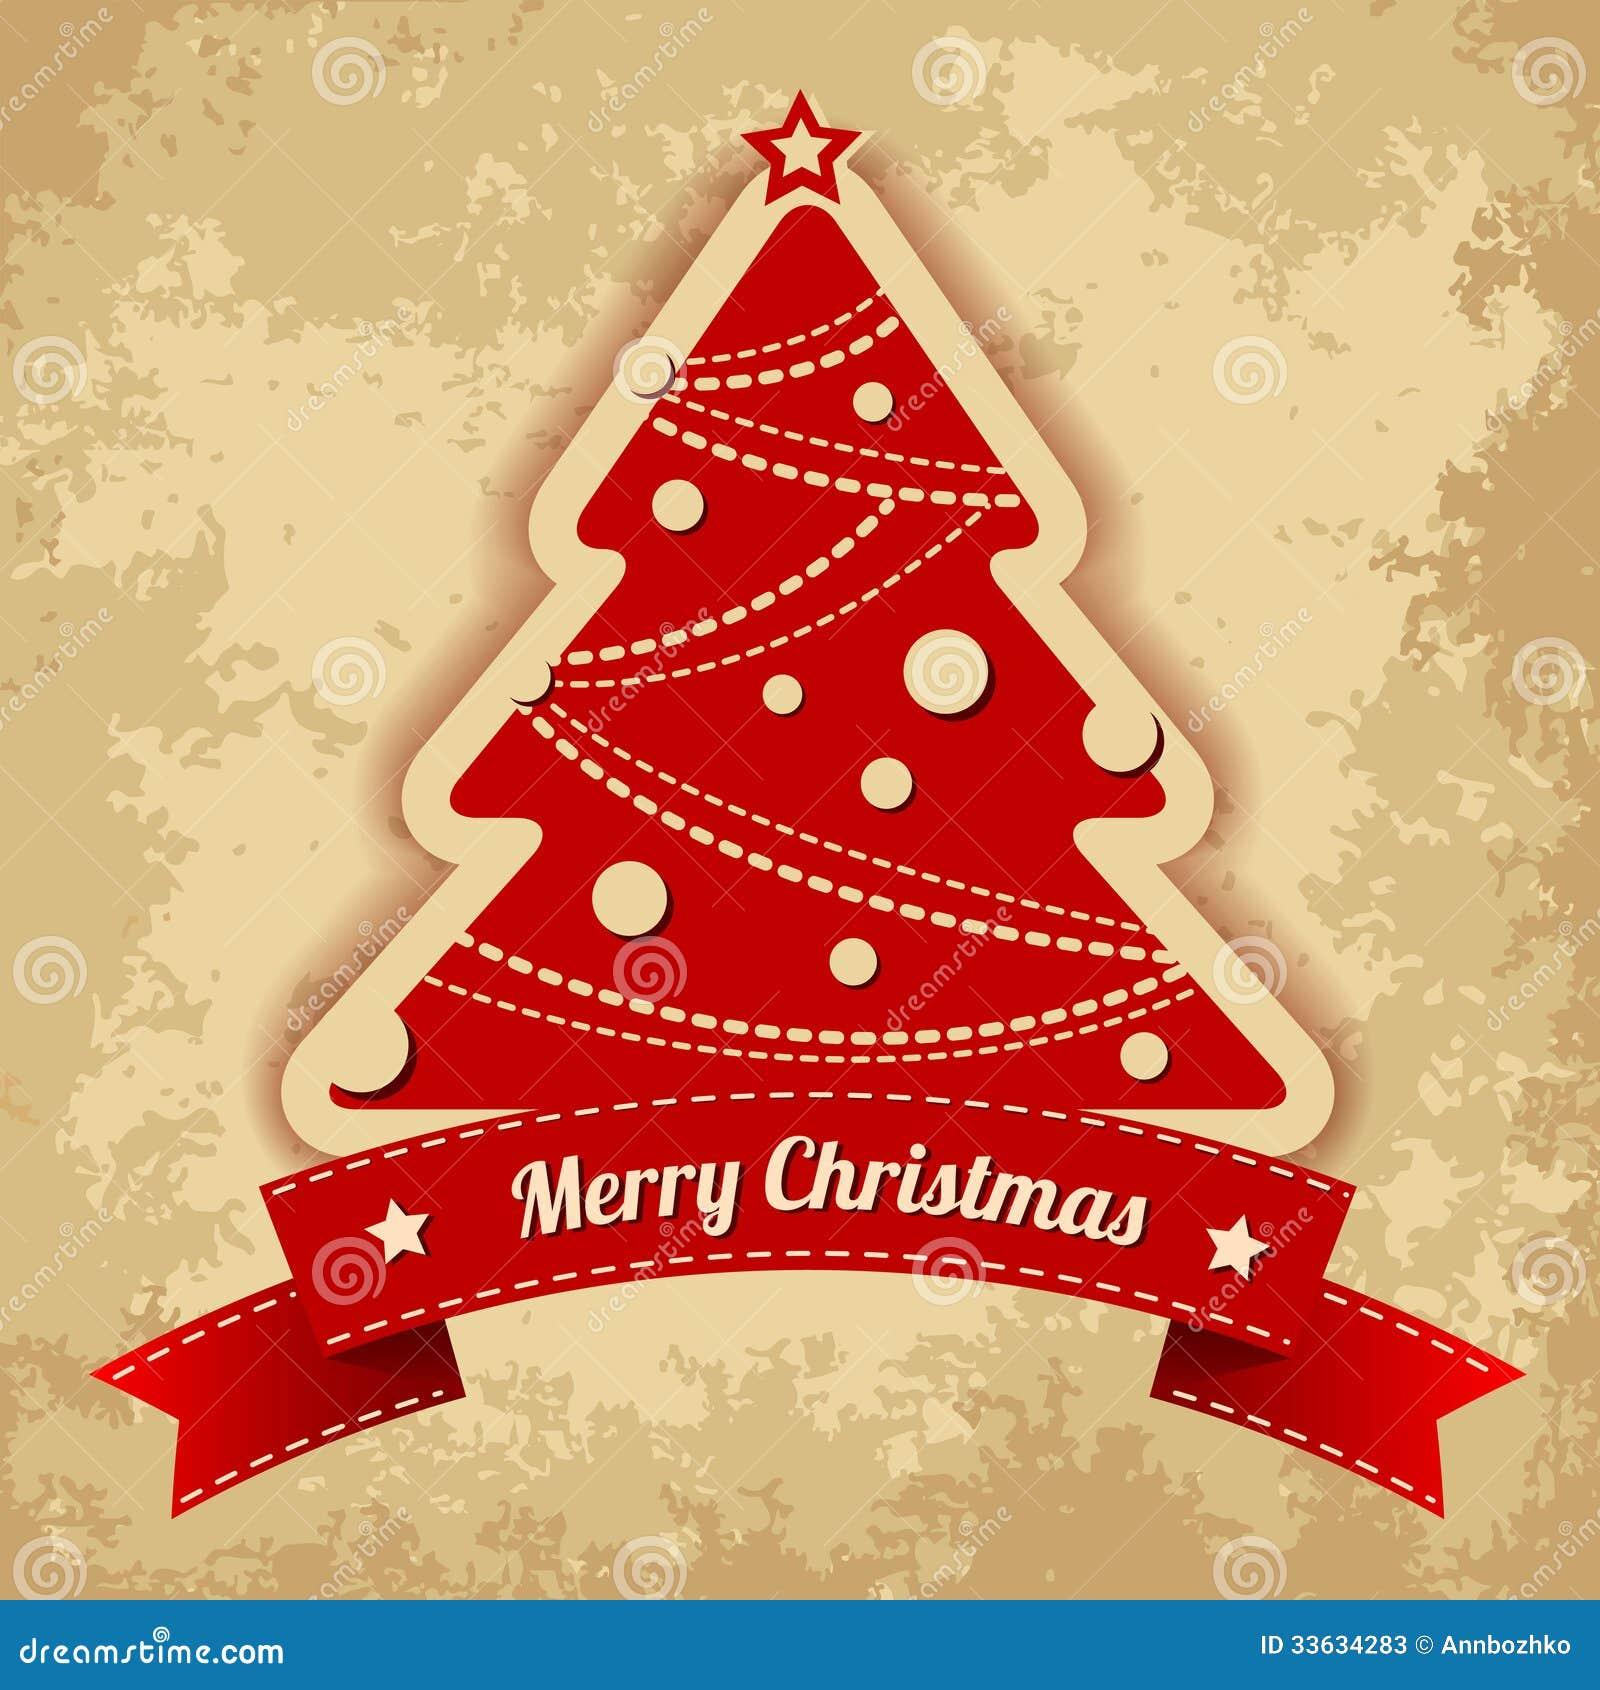 background christmas tree vintage - Retro Christmas Tree